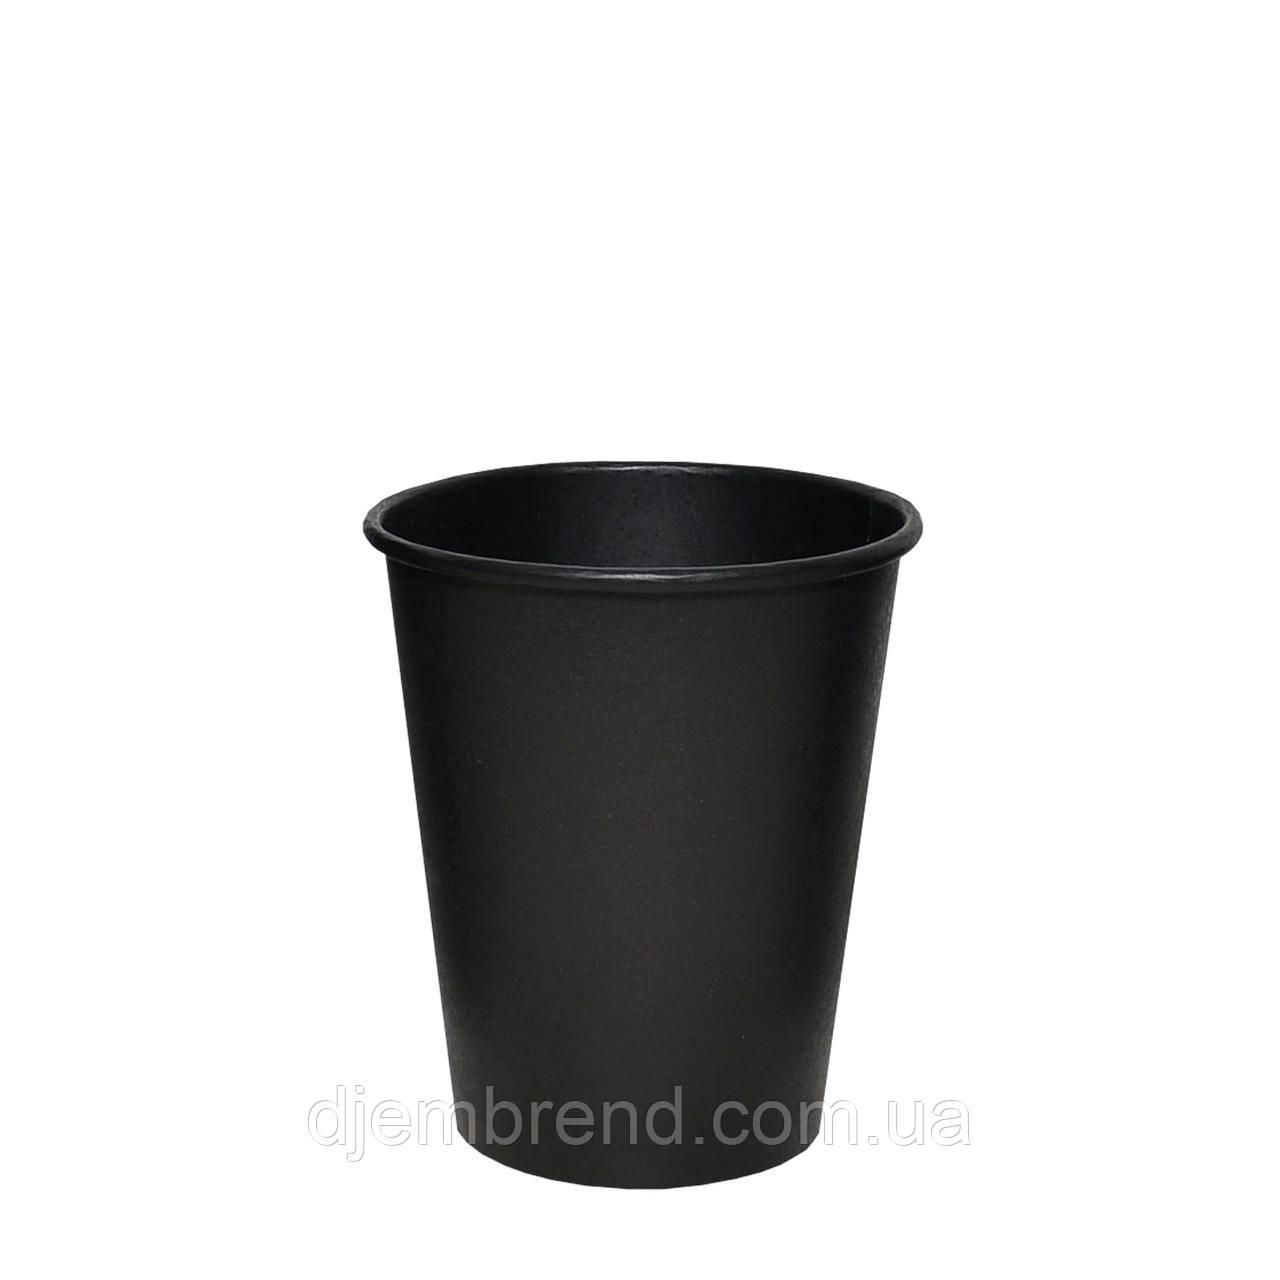 Стакан бумажный Крафт черный 250мл, 50шт/уп  (КВ79)